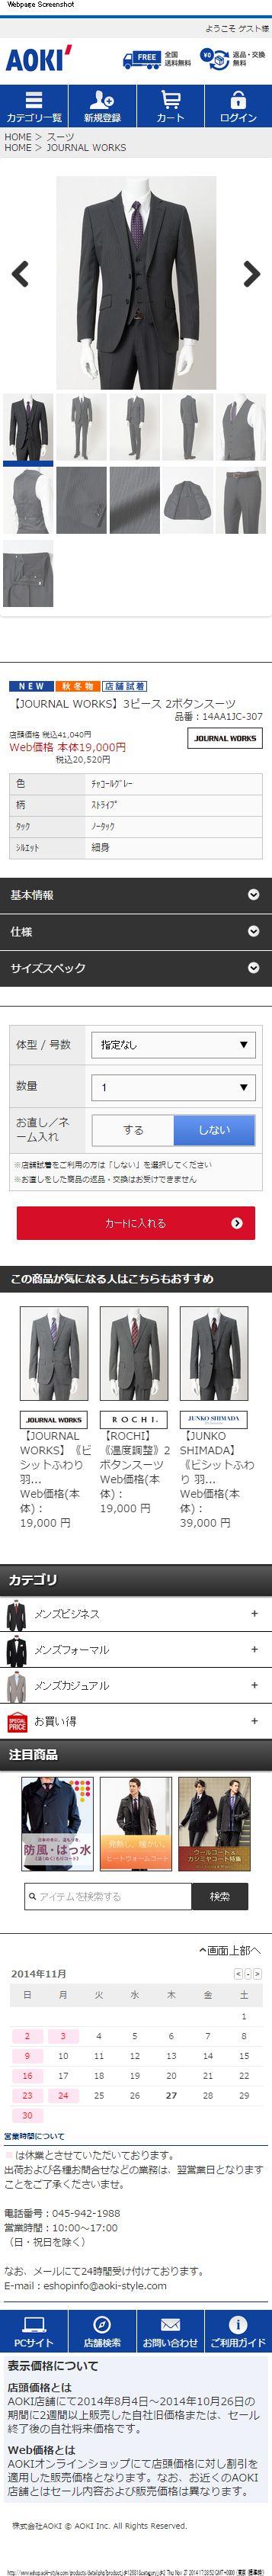 AOKIオンラインショップ|【JOURNAL WORKS】3ピース 2ボタンスーツ